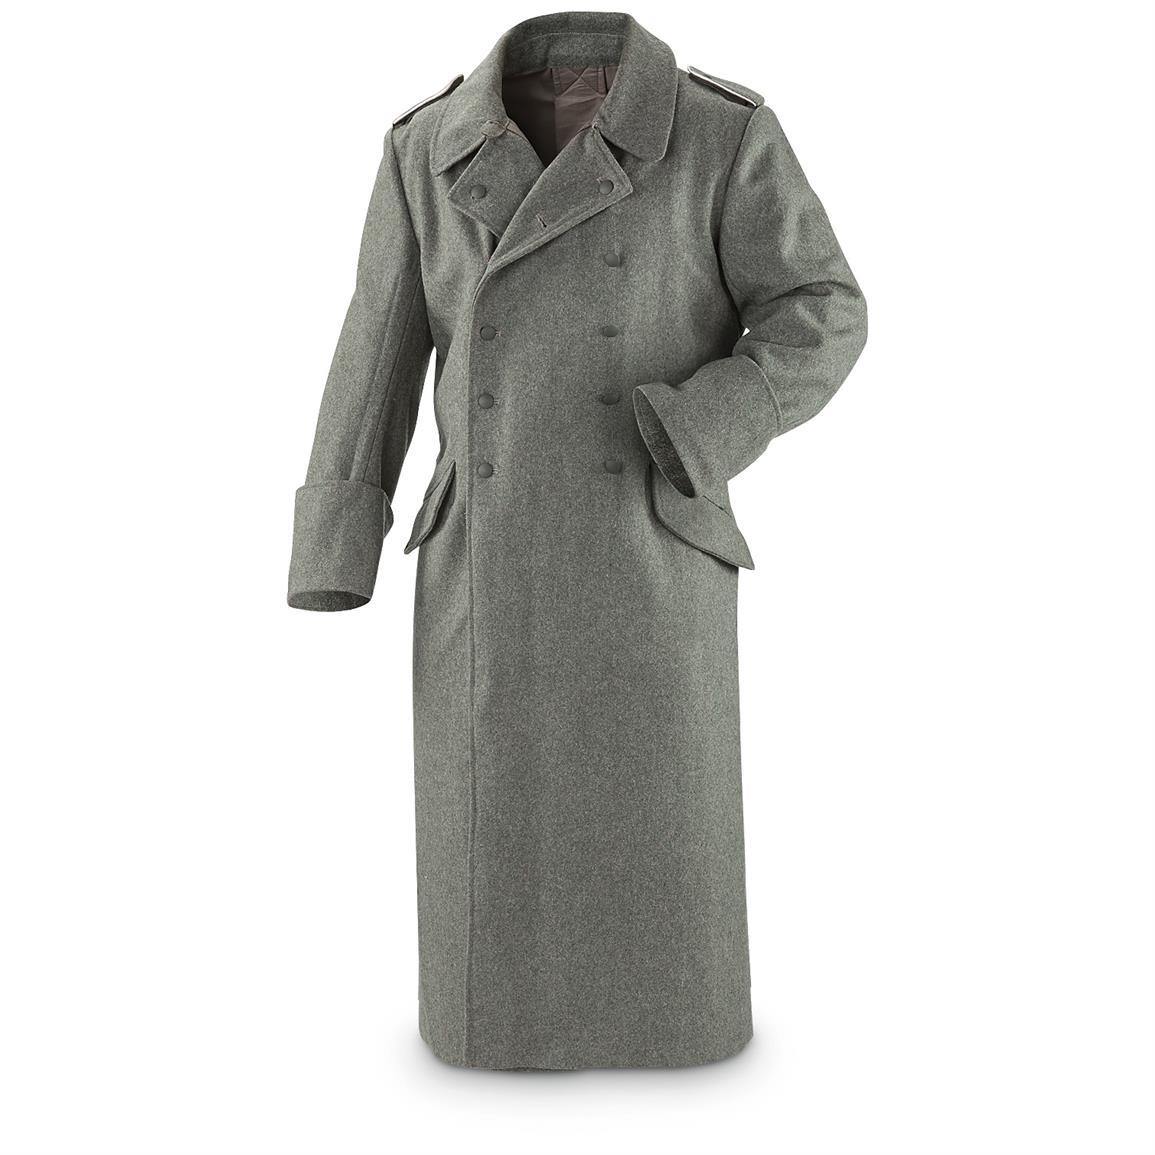 Erwin Rommel's Trenchcoat